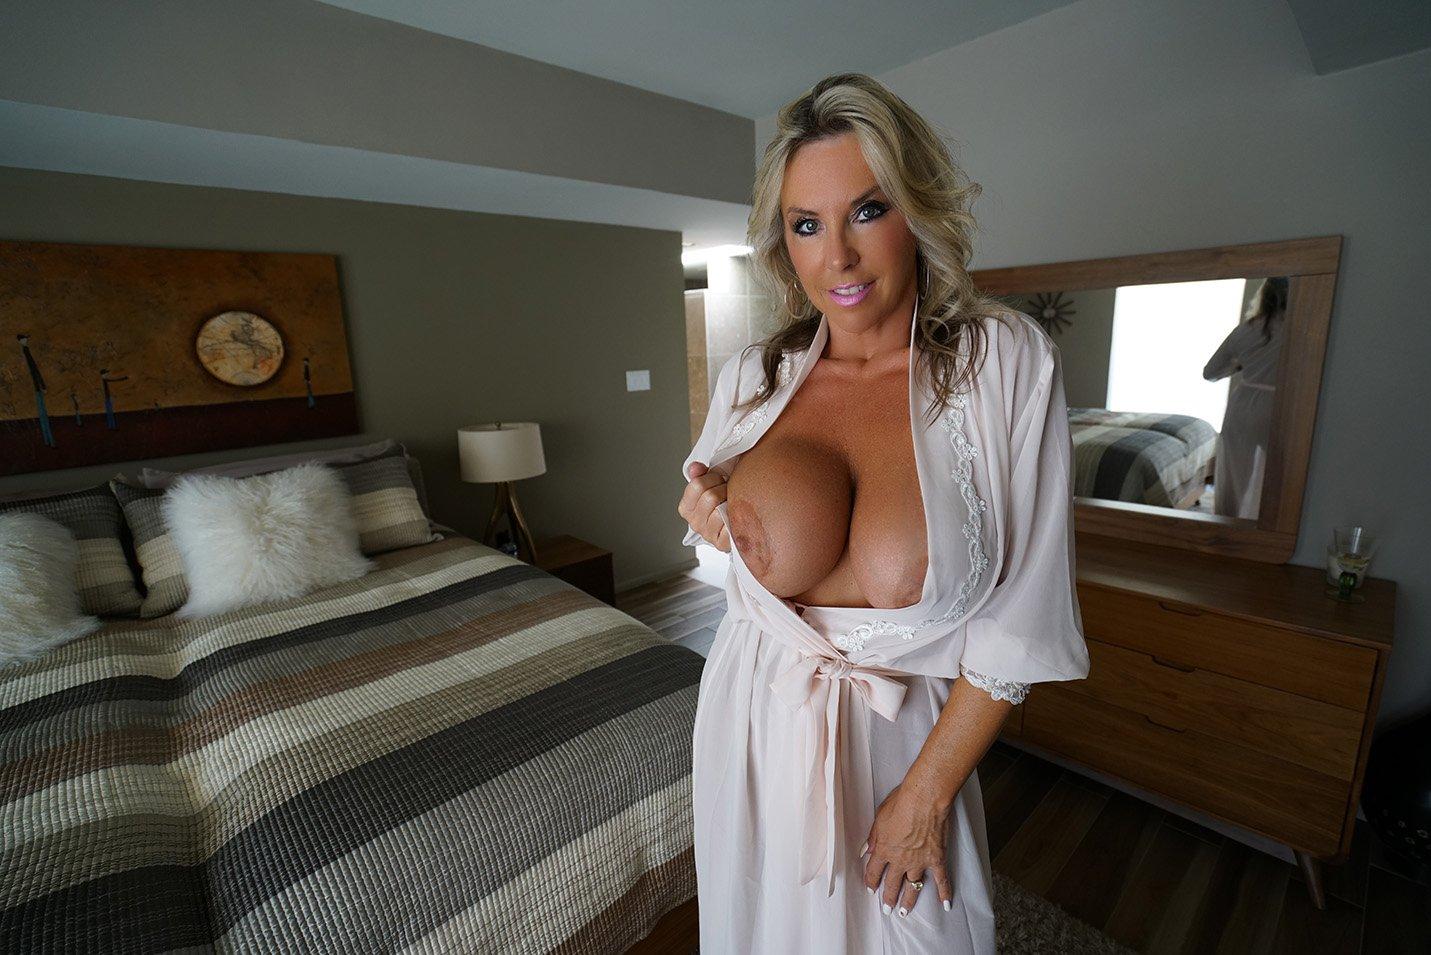 wifeys-world-topless-pornstar-elizabeth-carson